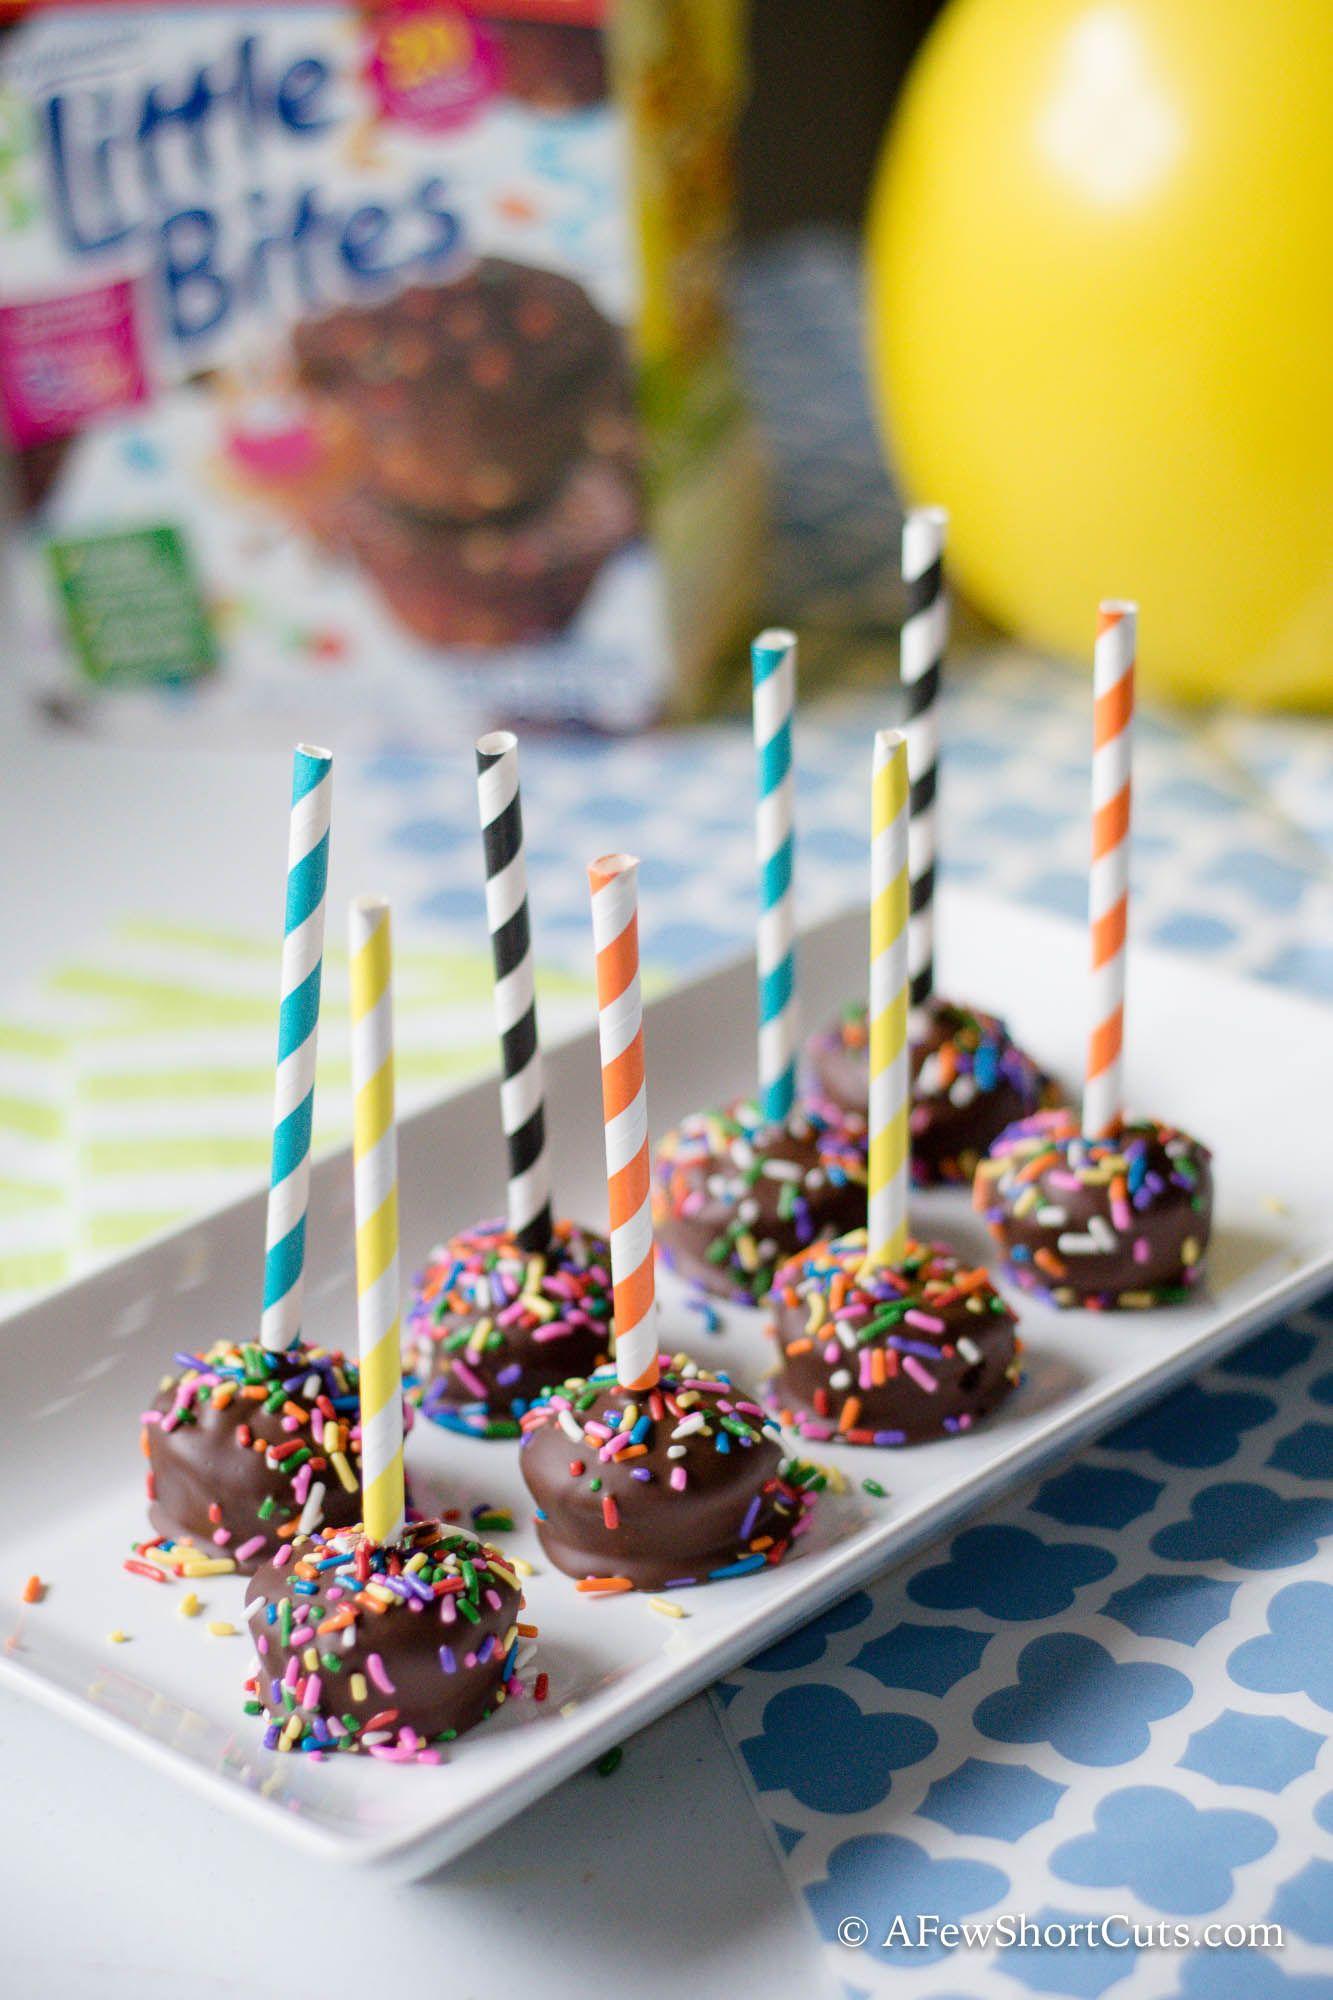 How to Make Beach Ball Cake Pops How to Make Beach Ball Cake Pops new foto